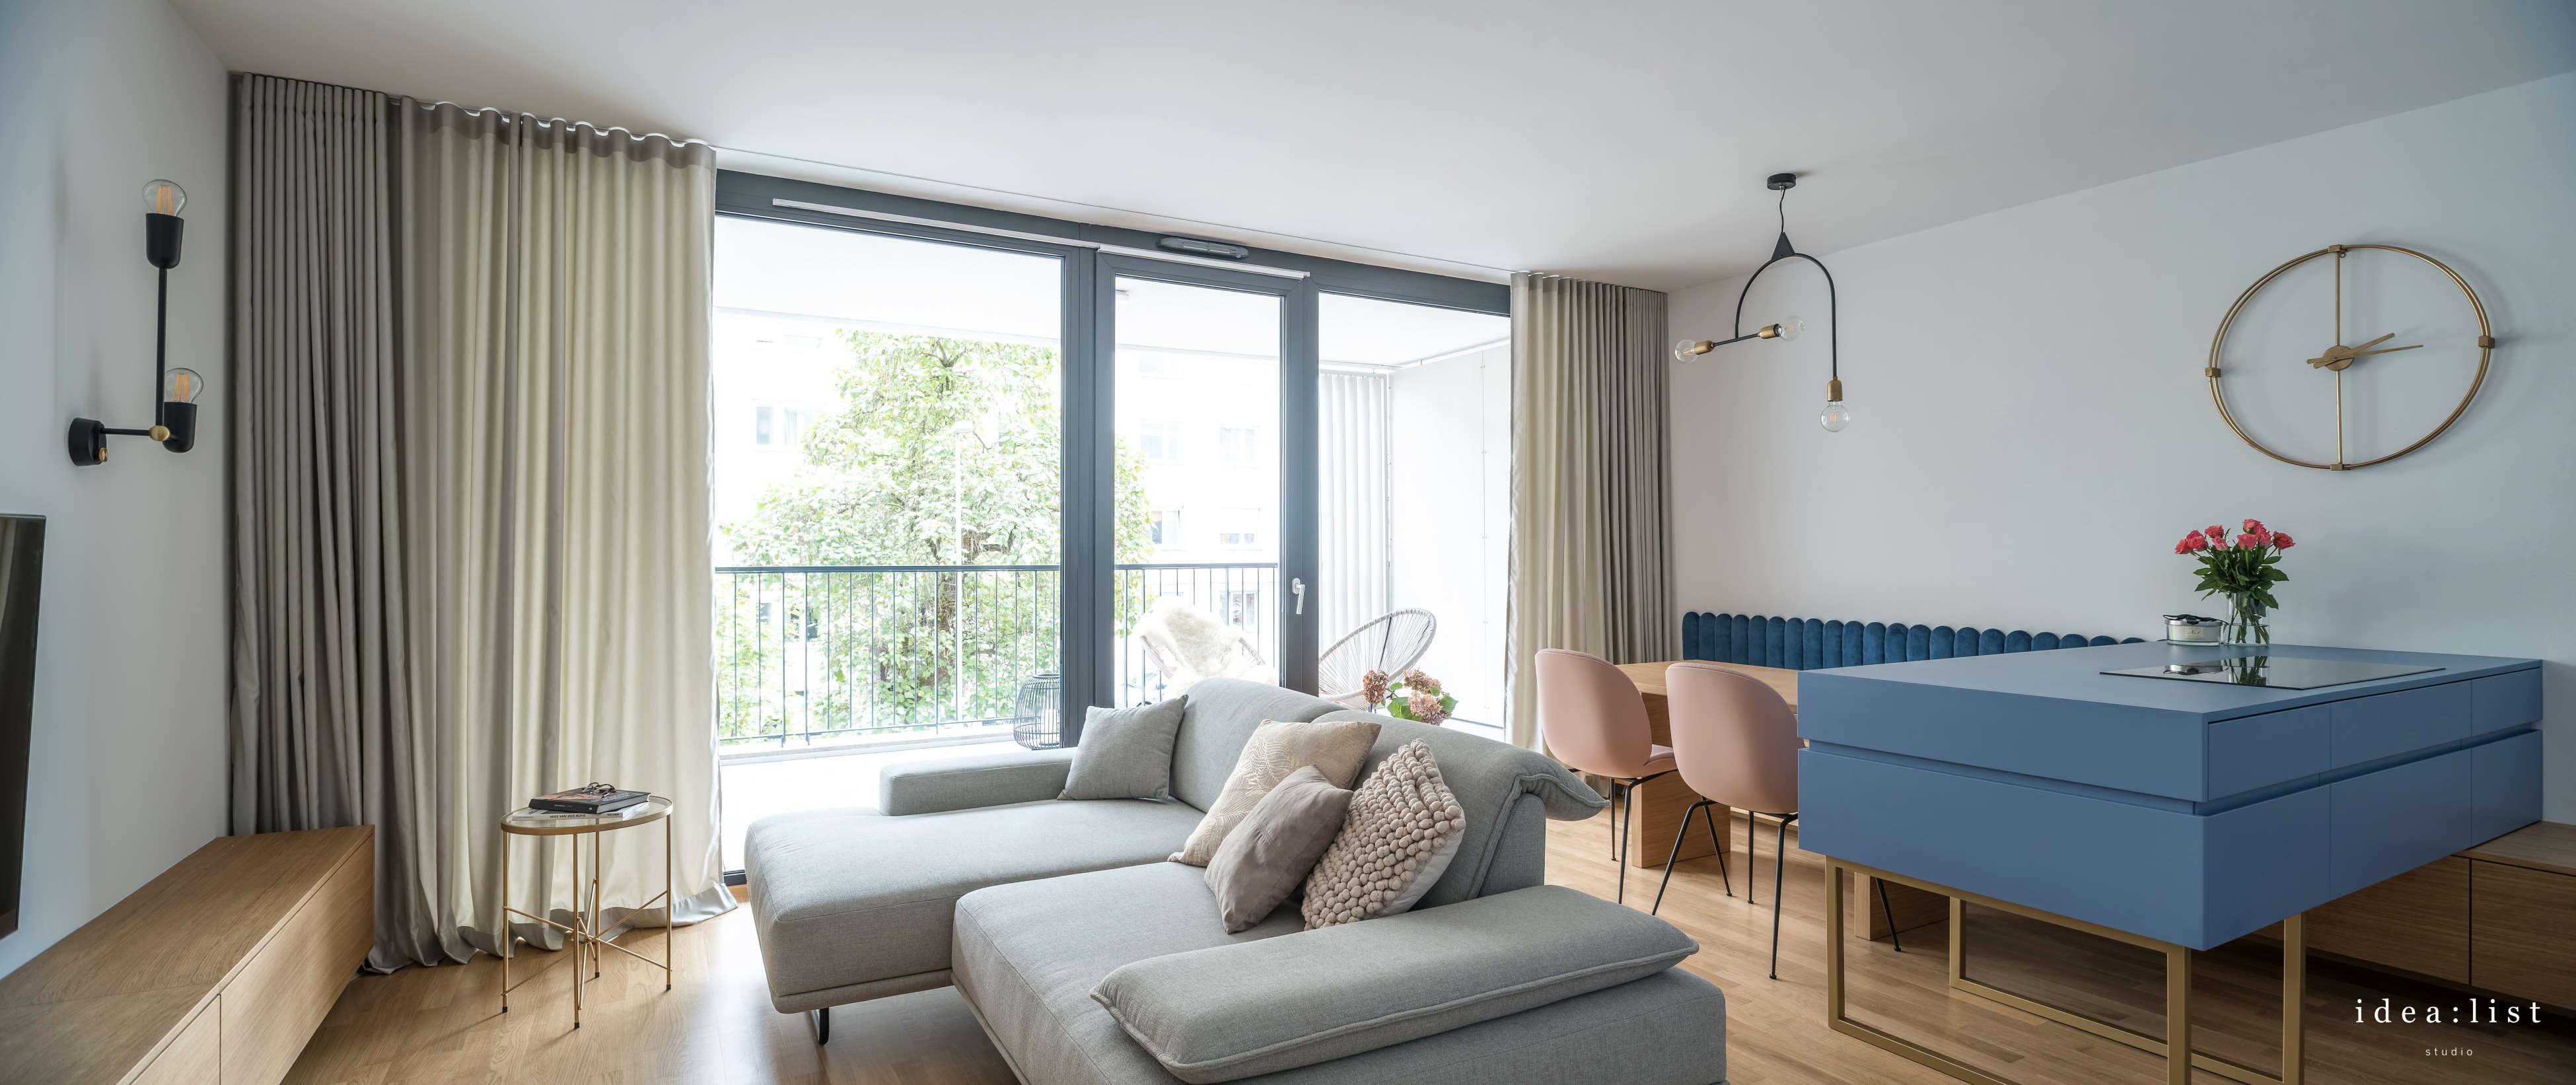 pohištvo po meri arhitekt mizar